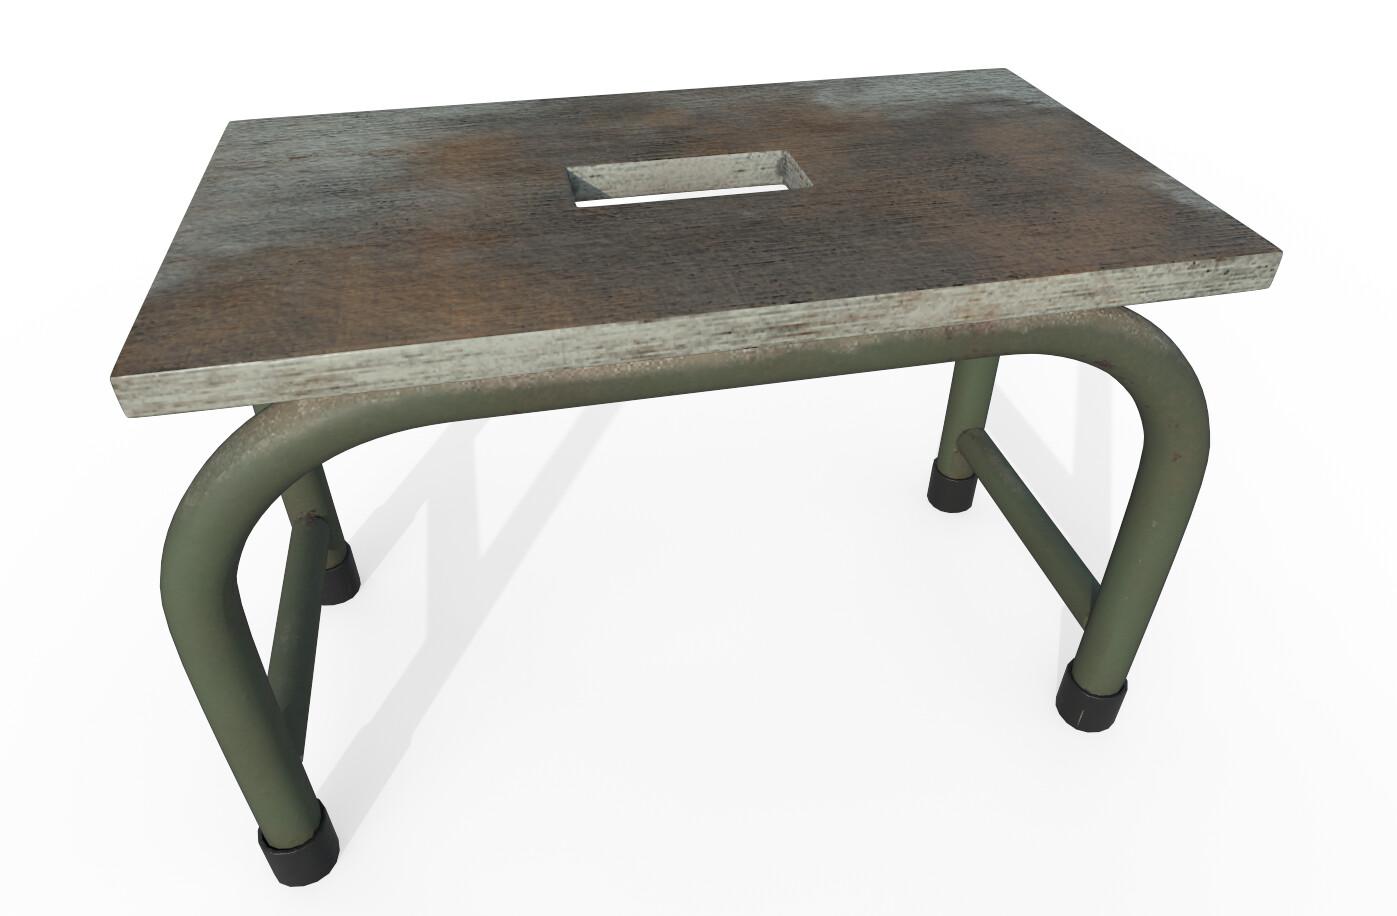 Joseph moniz footstool001f